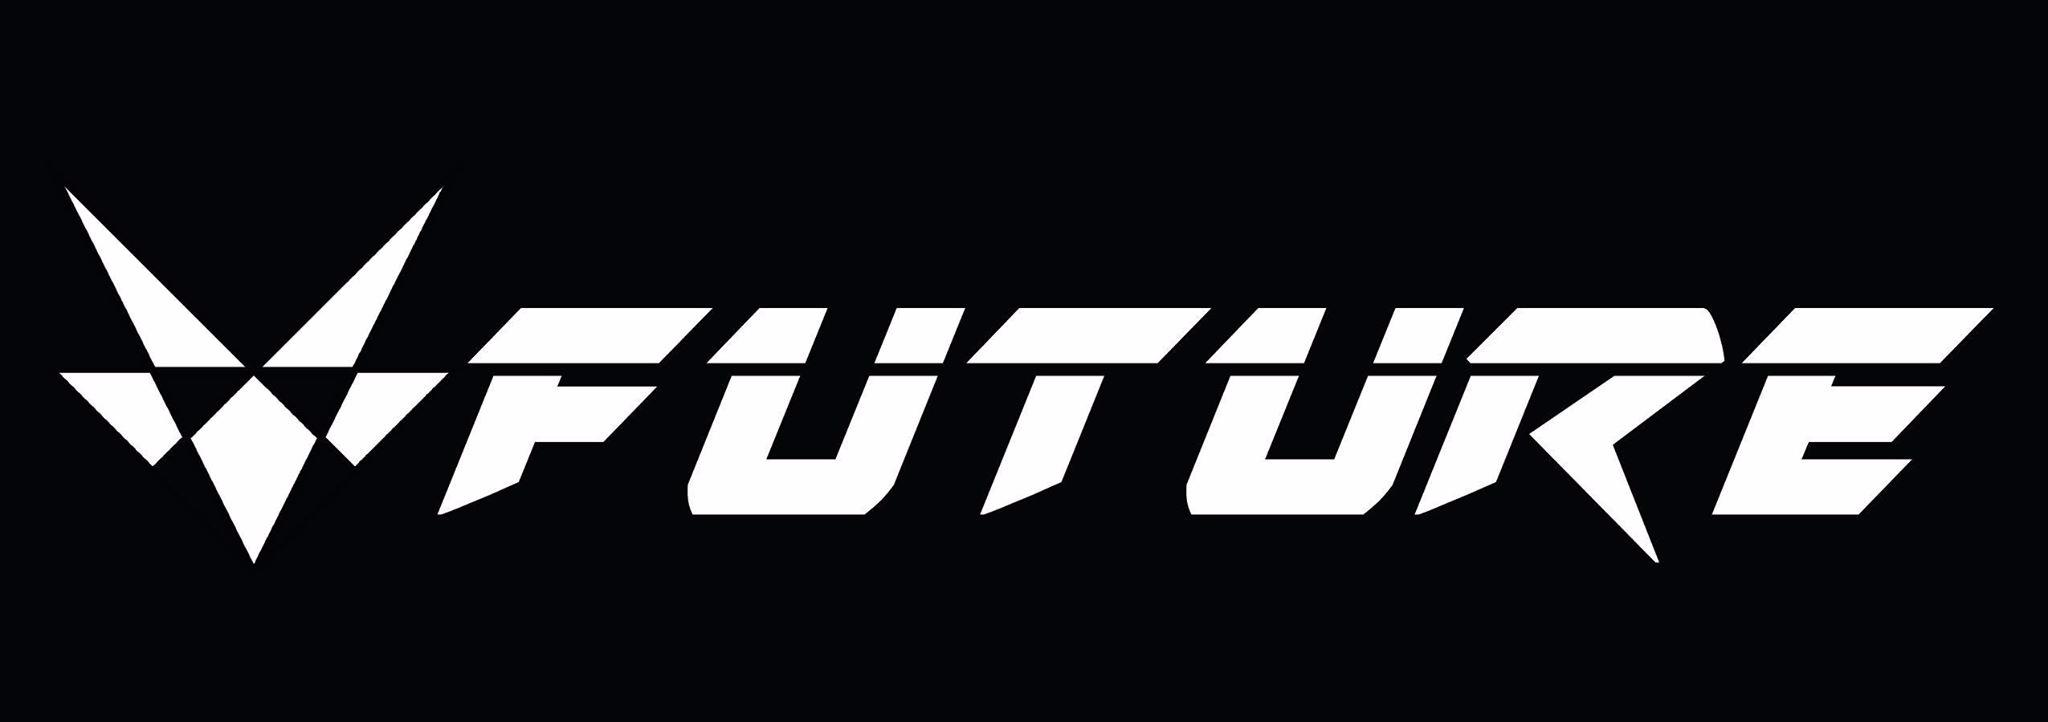 V- (@vfuture) Cover Image